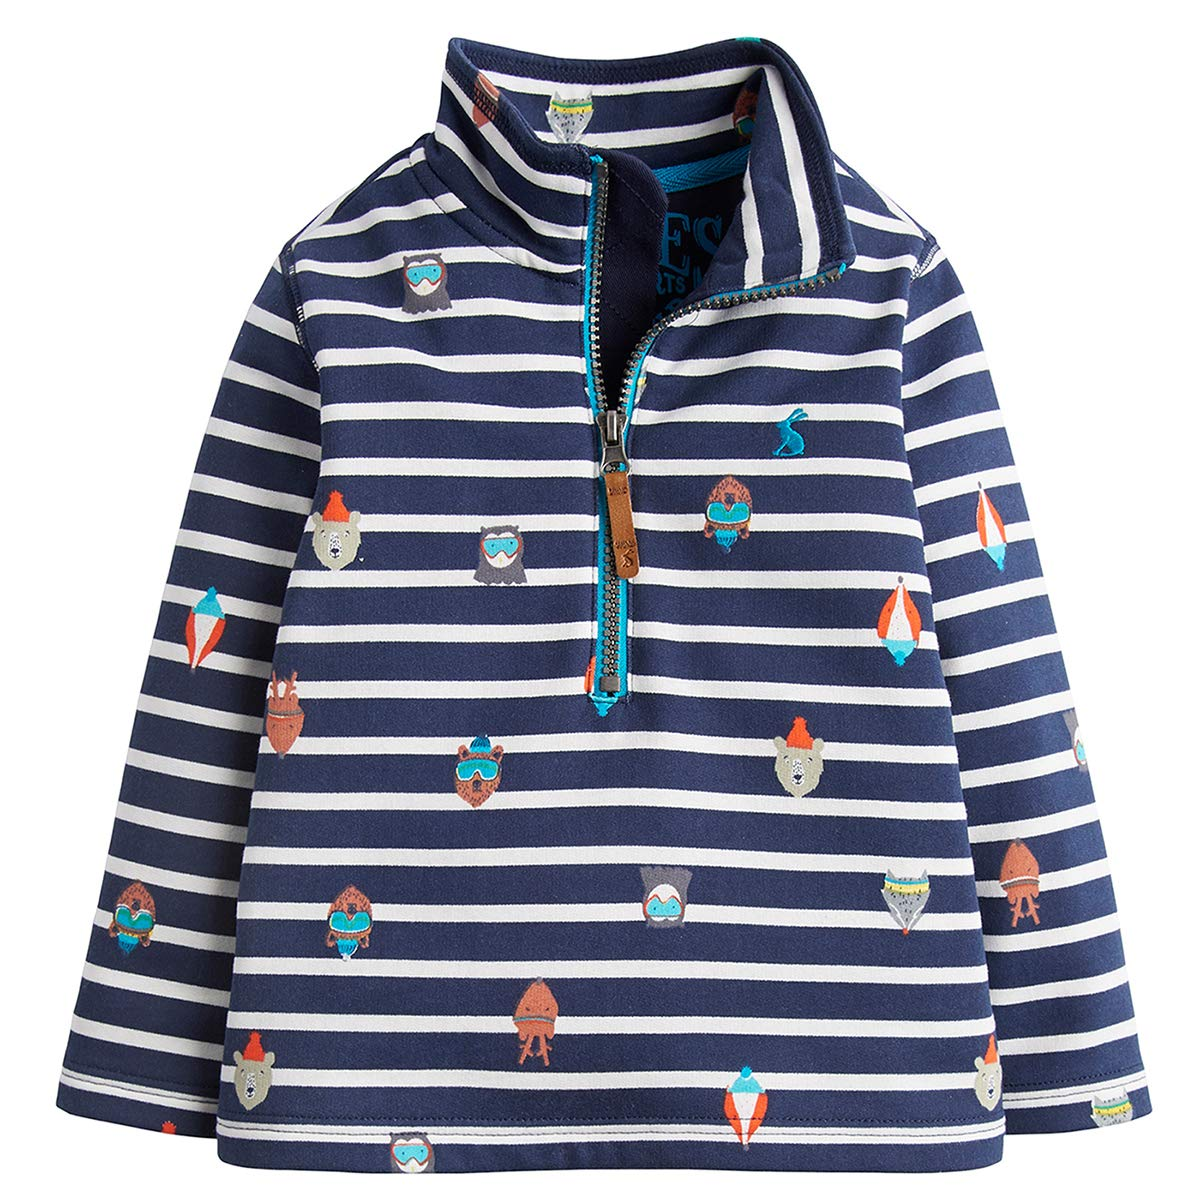 Joules Half Zip Sweatshirt - French Navy Animals